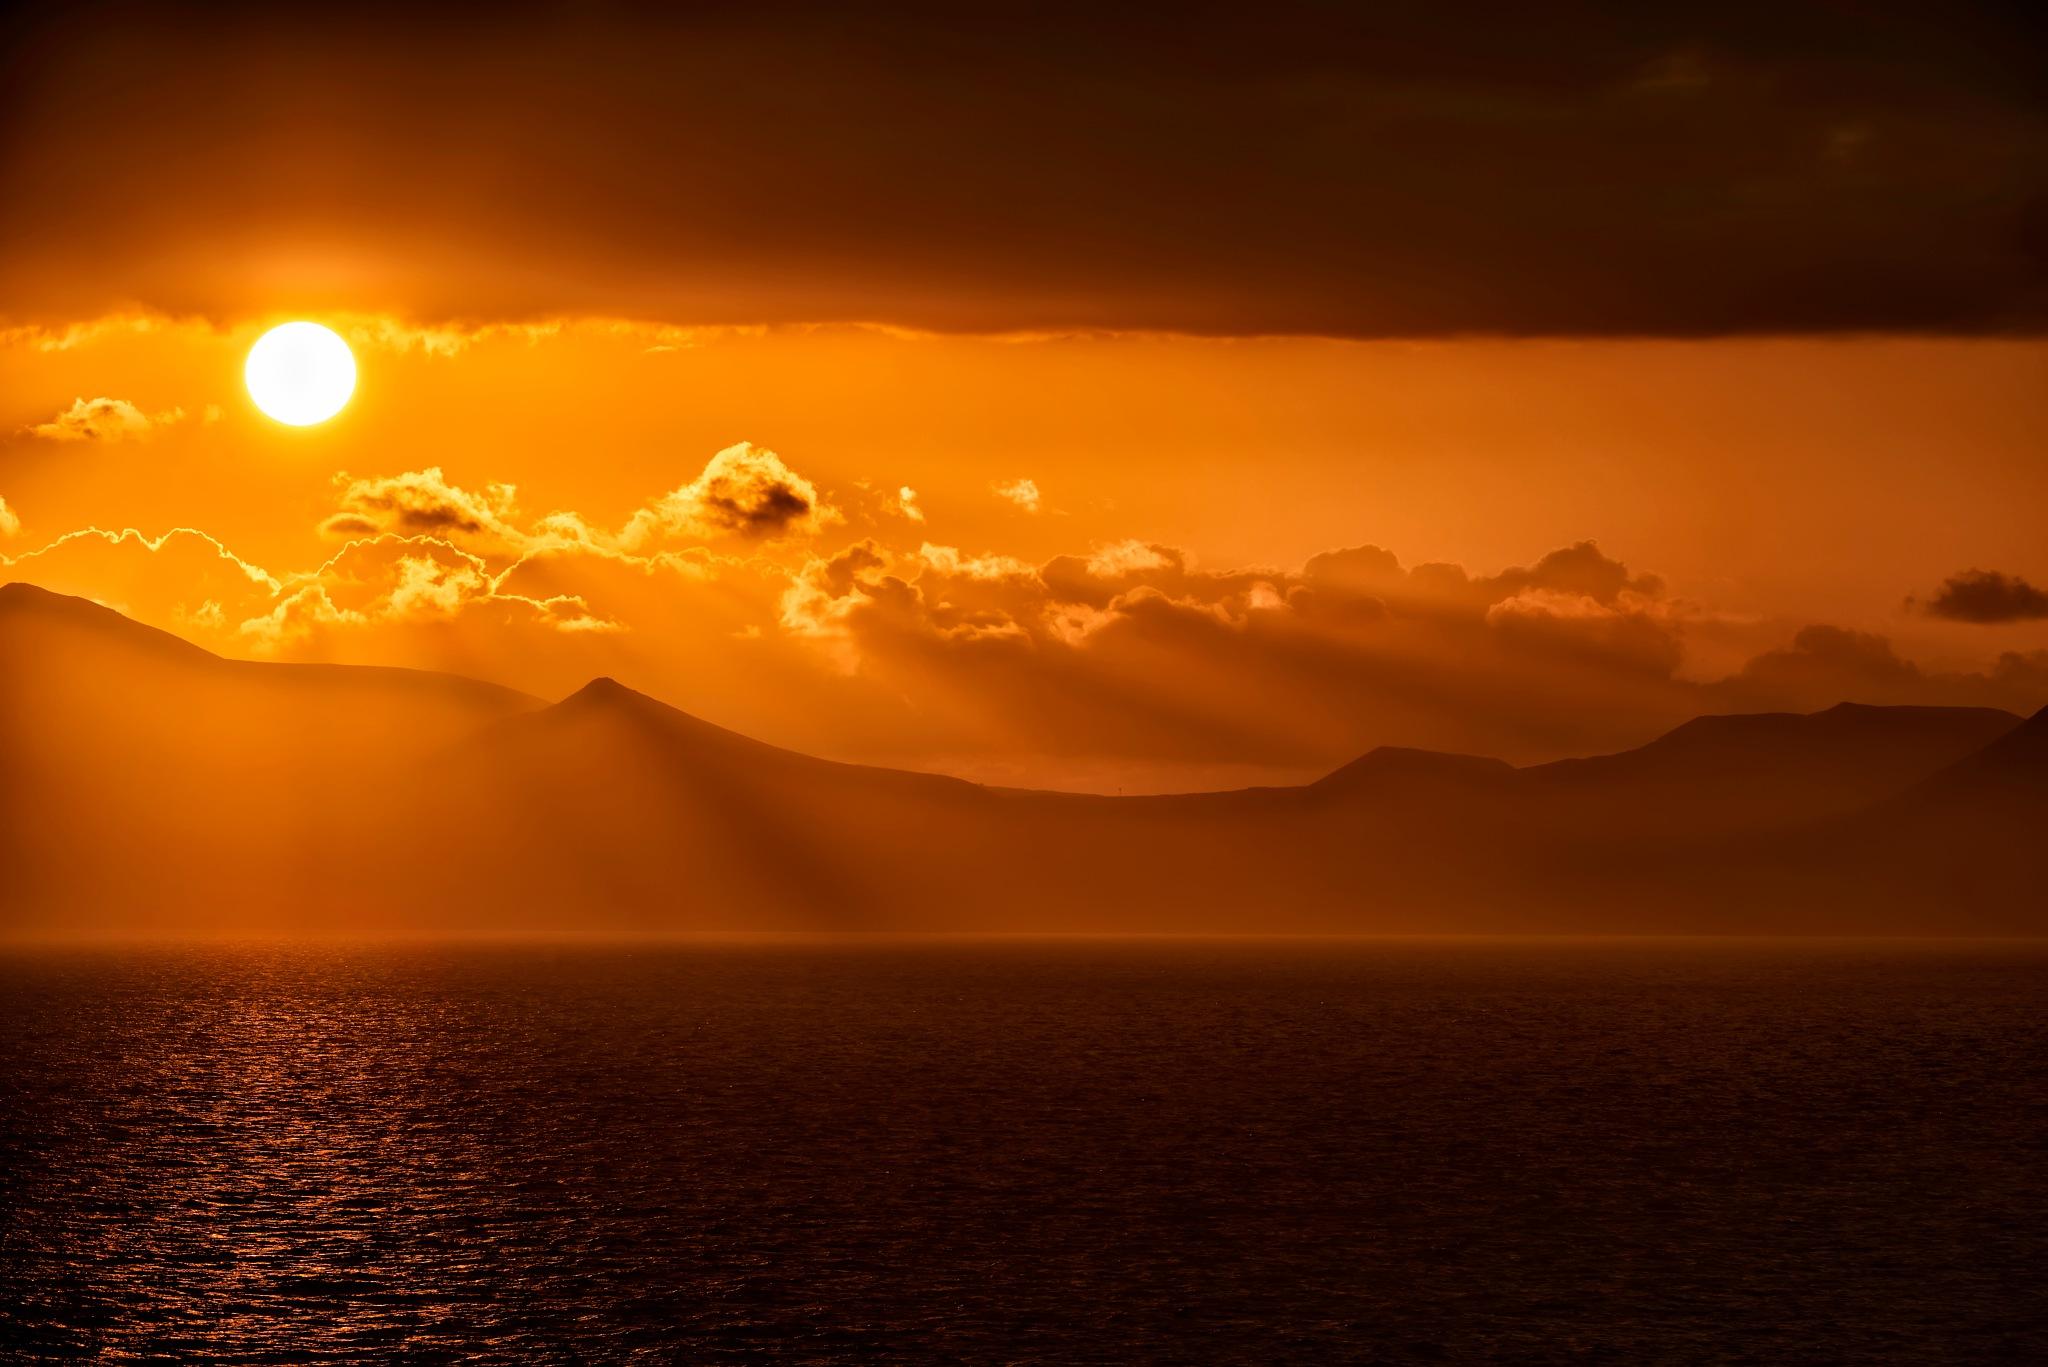 Burning Sun by Silviu Gheorghe Ionut